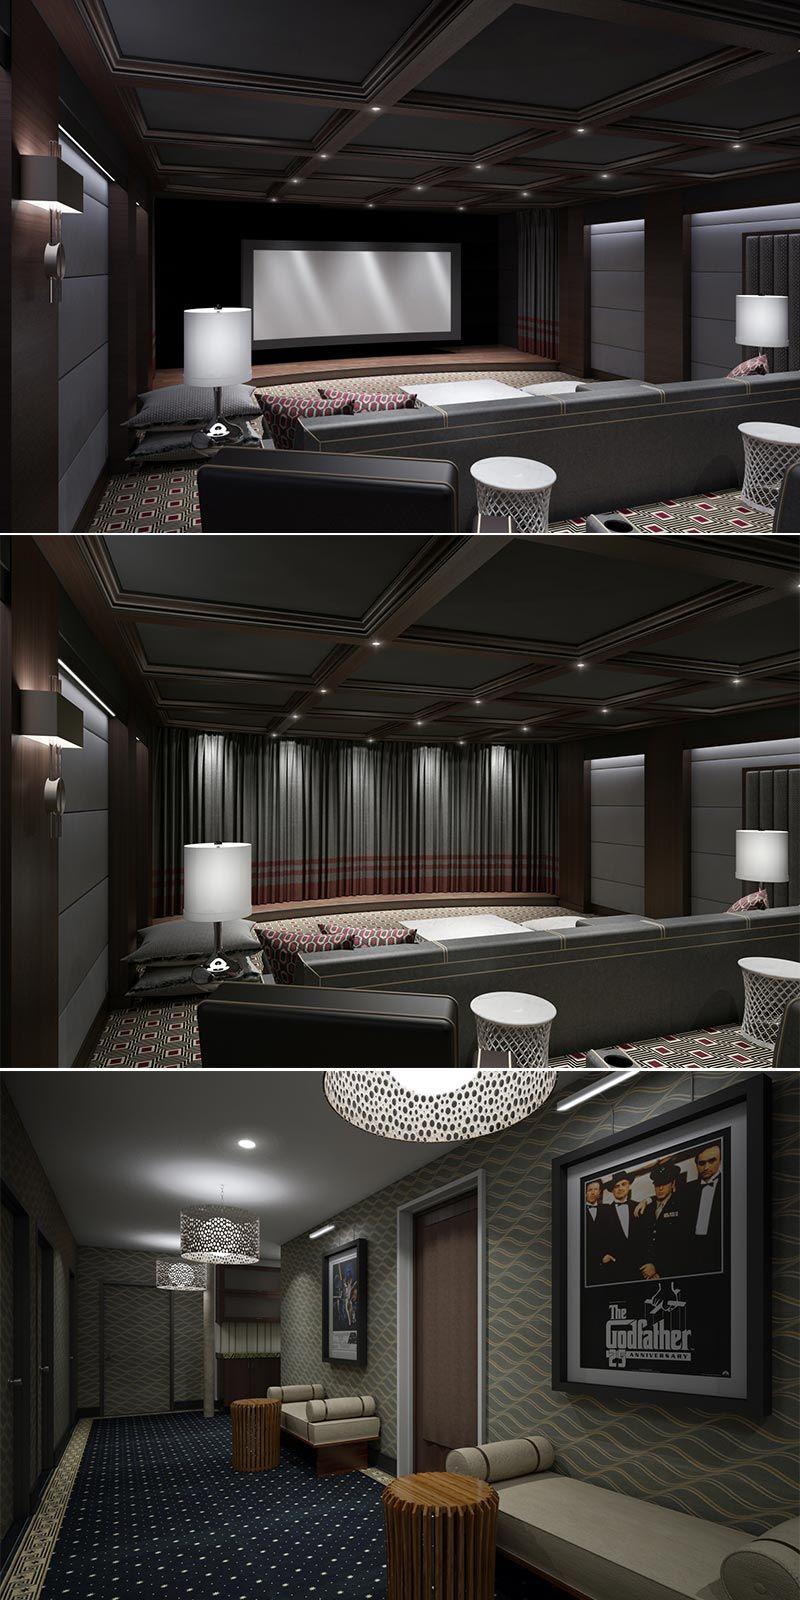 Small Home Theater Room Design: Luxury Home Cinema Interior Design By Clark Gaynor